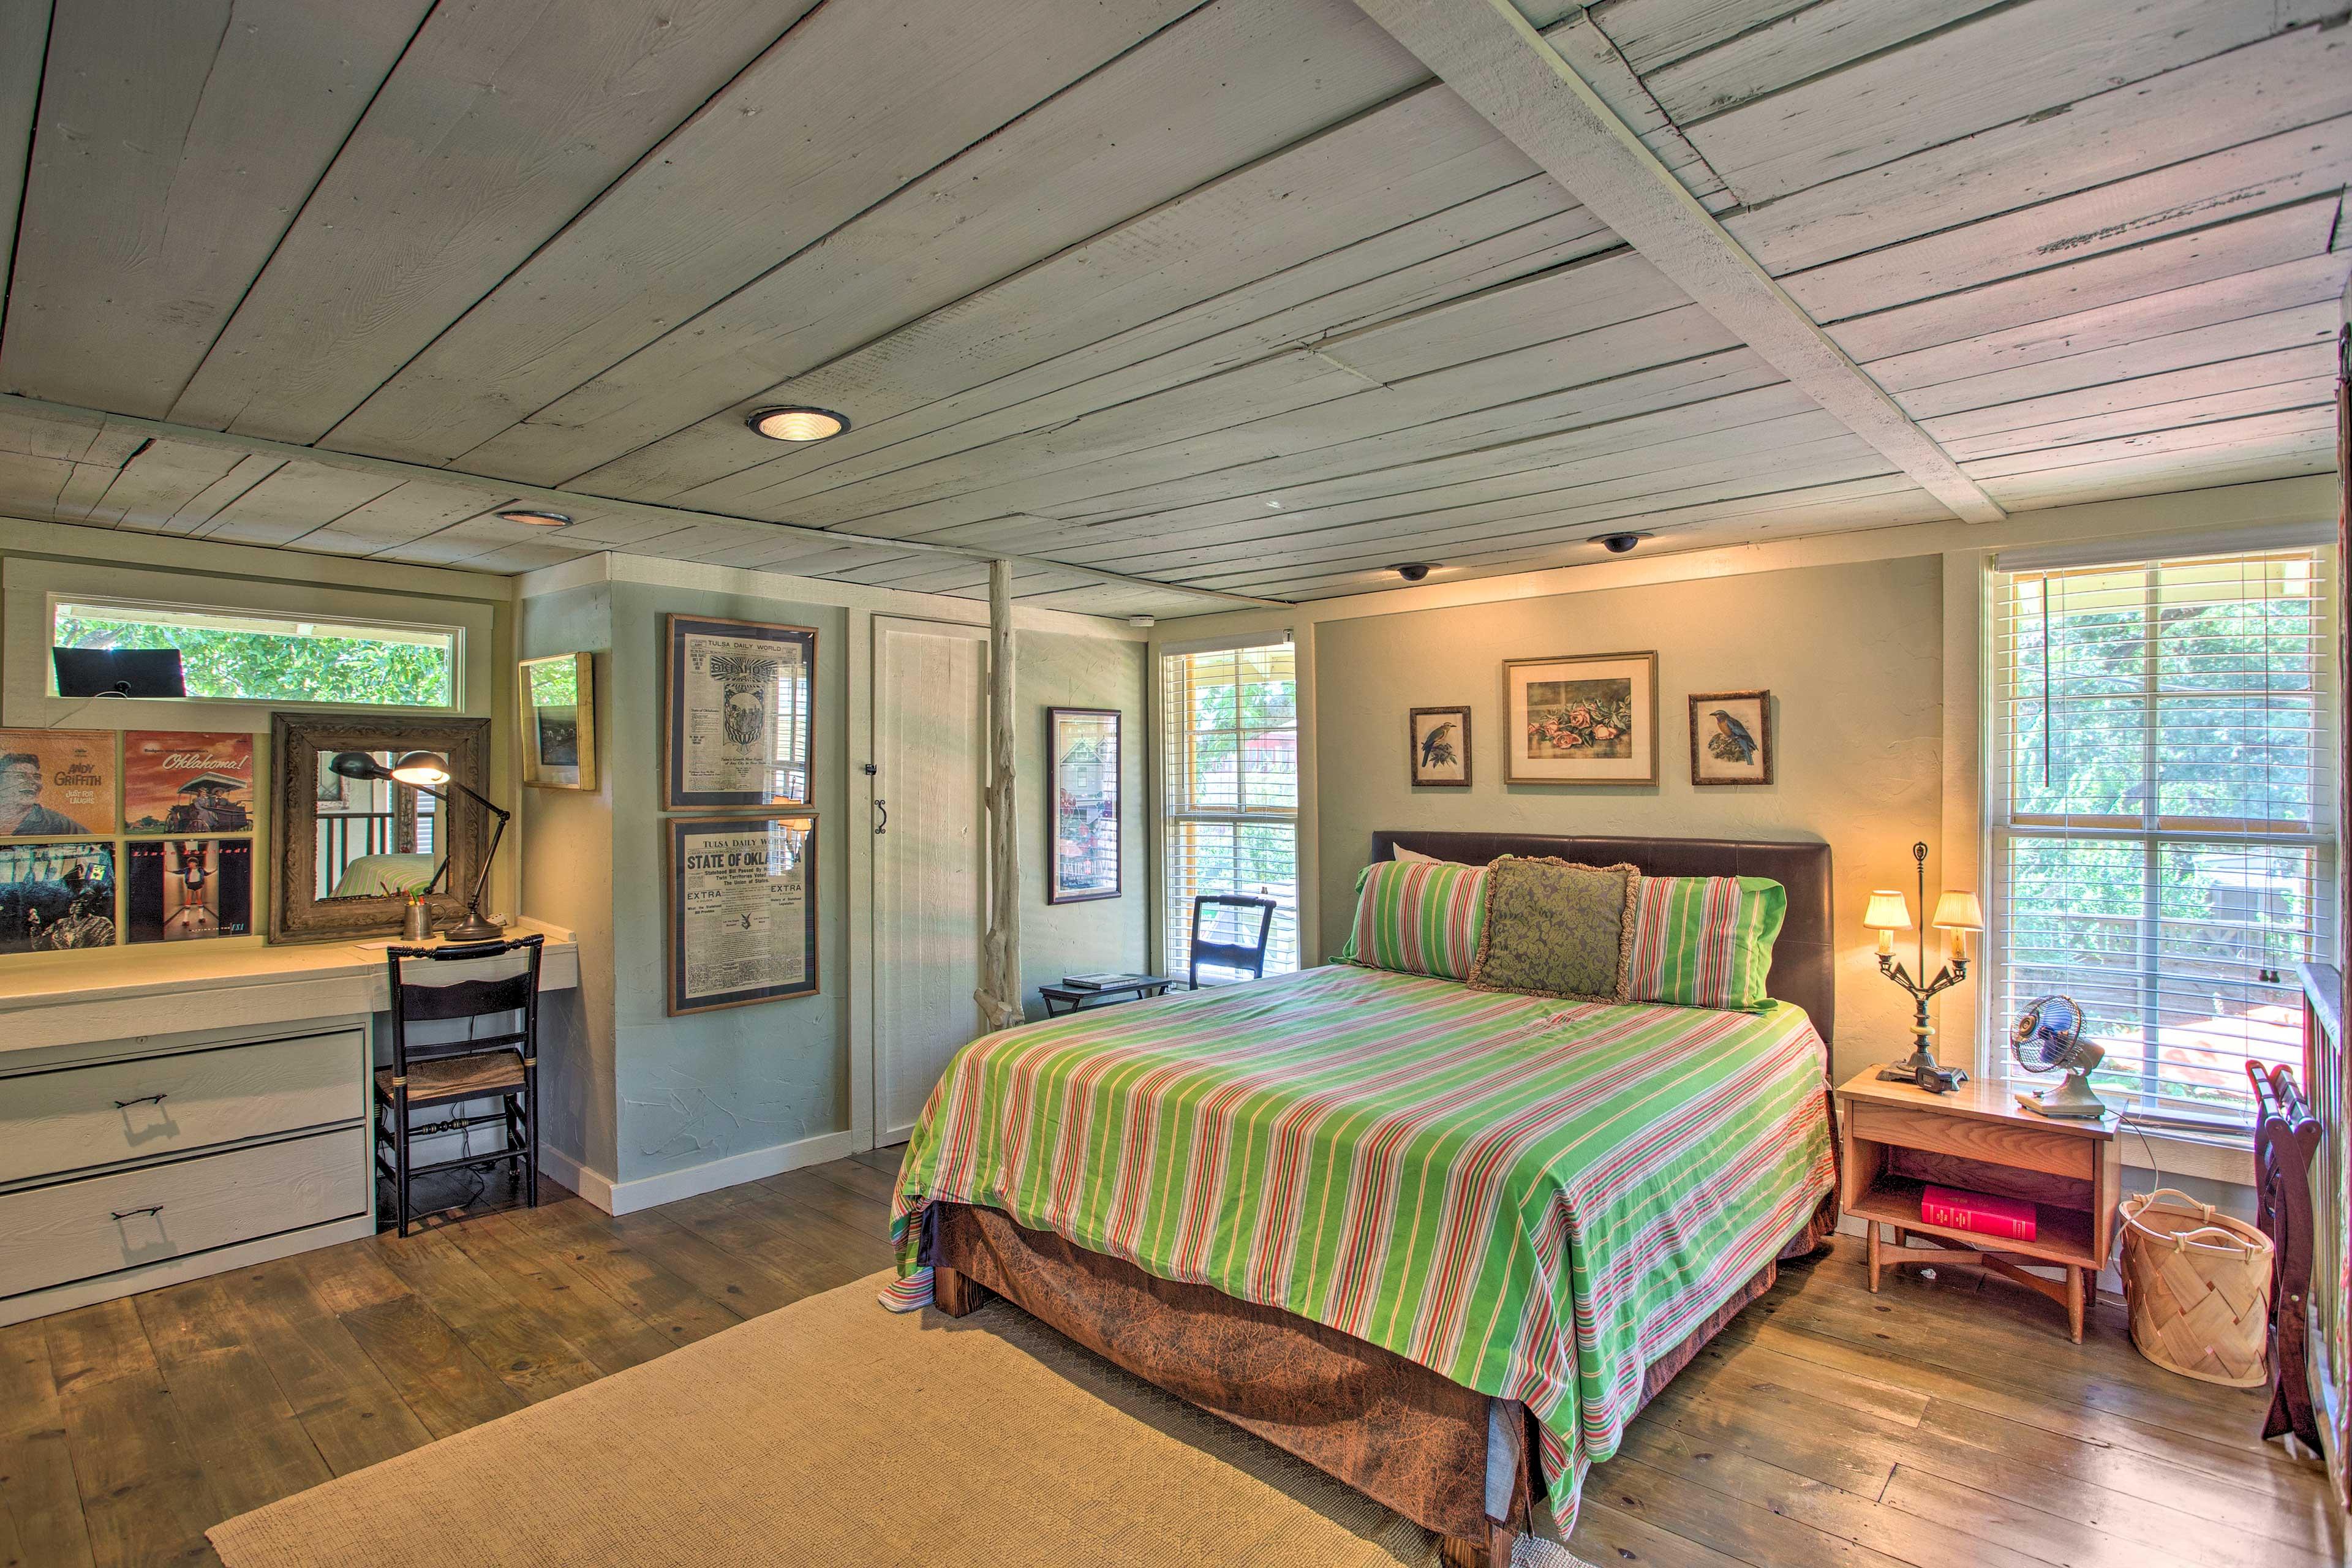 Upstairs, the bedroom features hardwood floors.